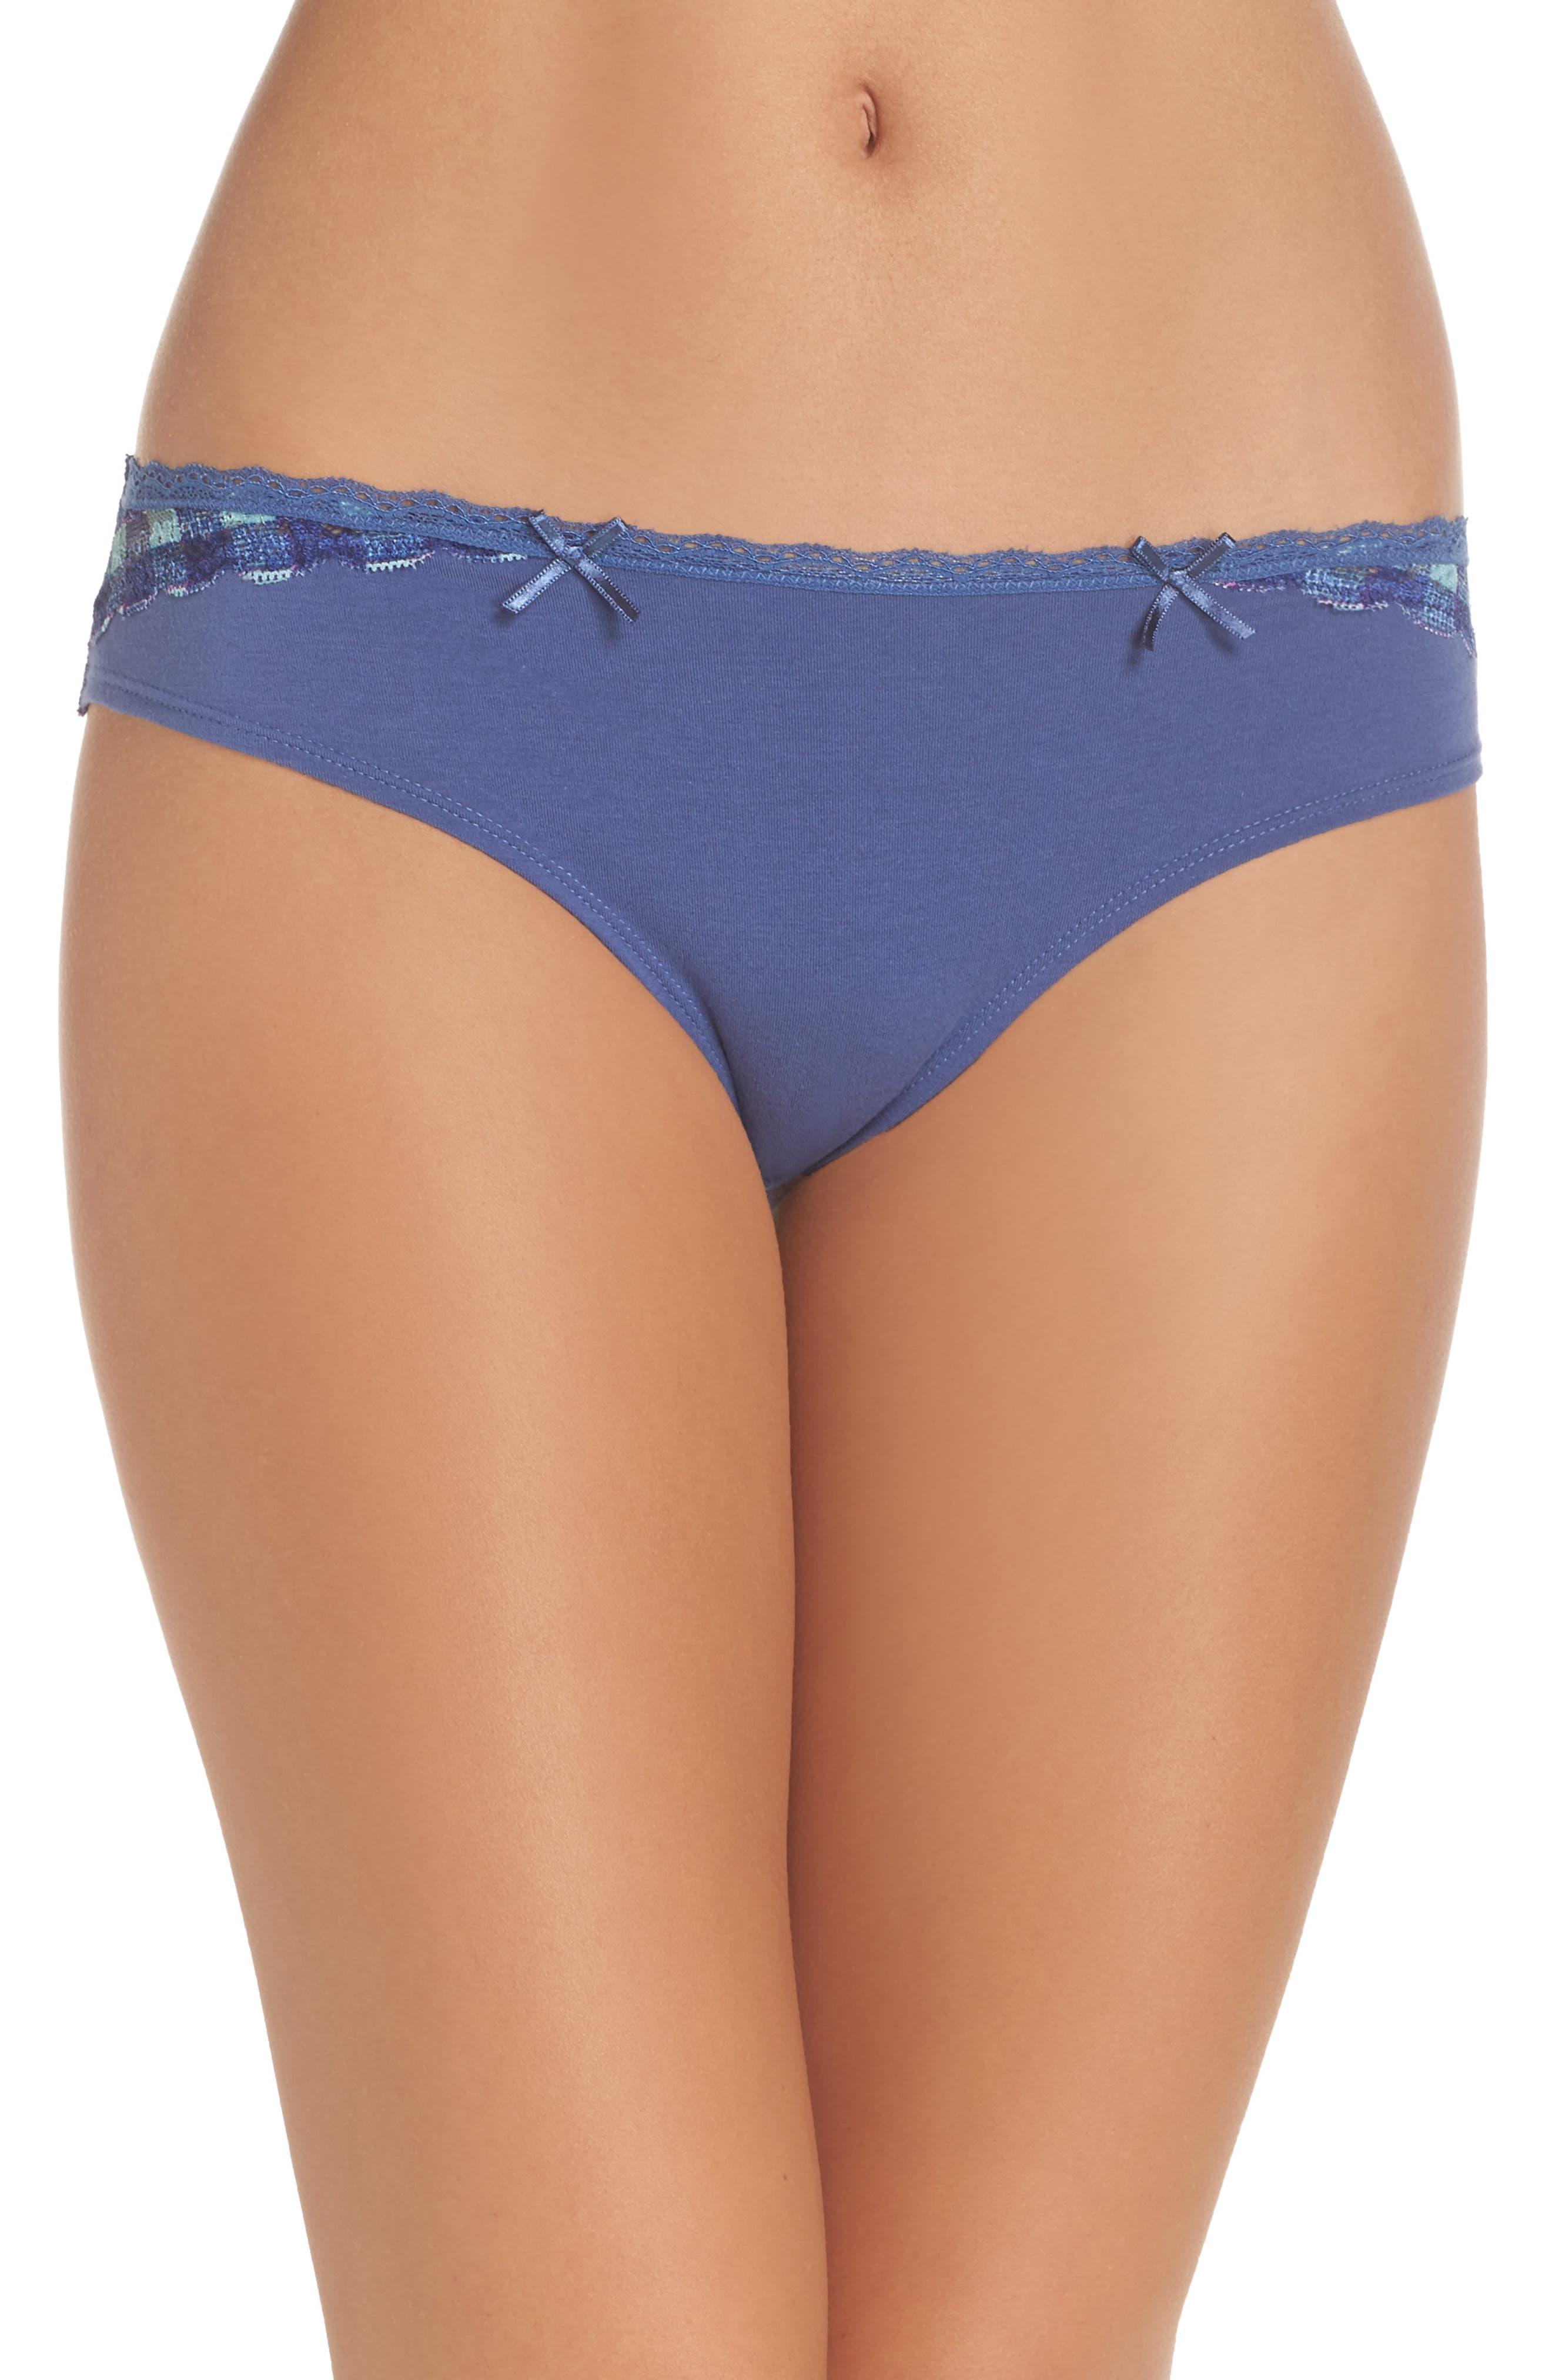 h.dew Becca Bikini (Regular & Plus Size)